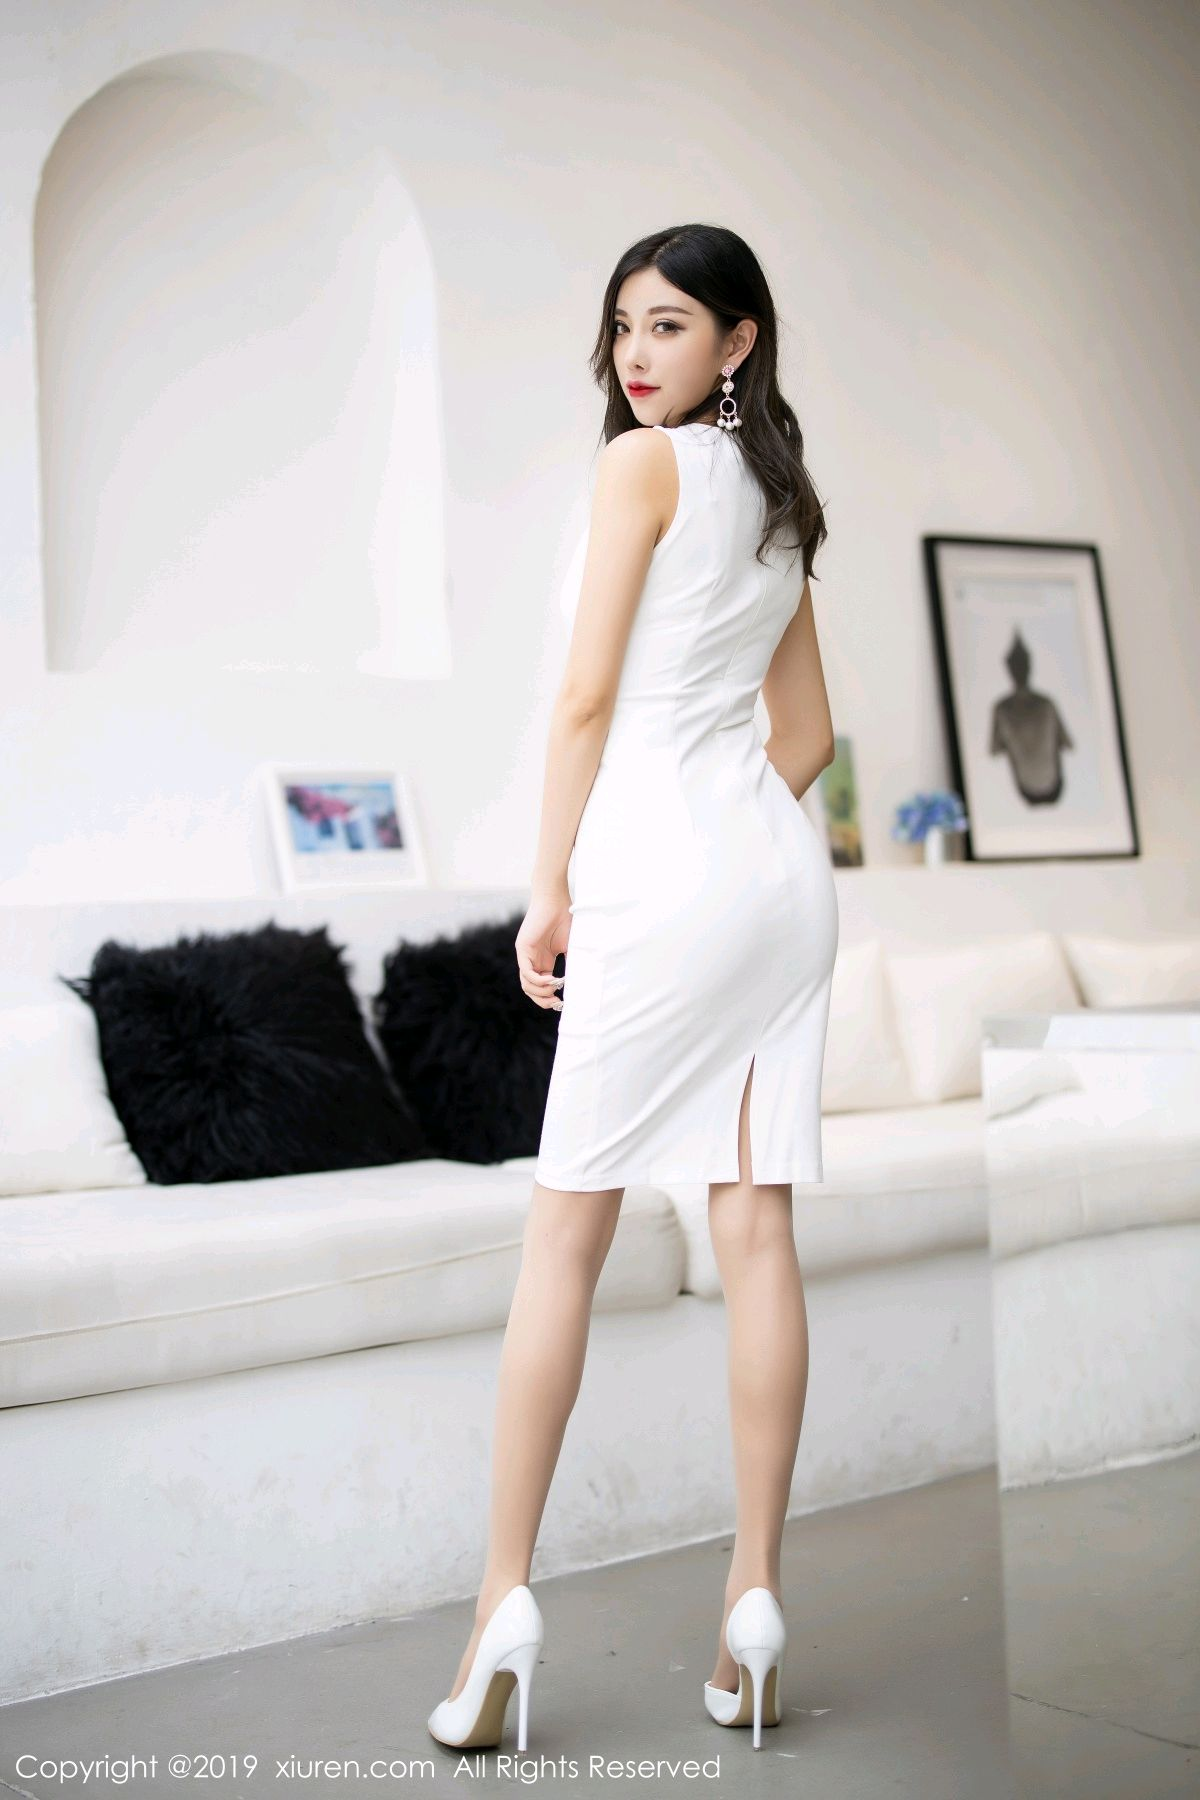 [XiuRen] Vol.1695 Yang Chen Chen 3P, Foot, Tall, Underwear, Xiuren, Yang Chen Chen